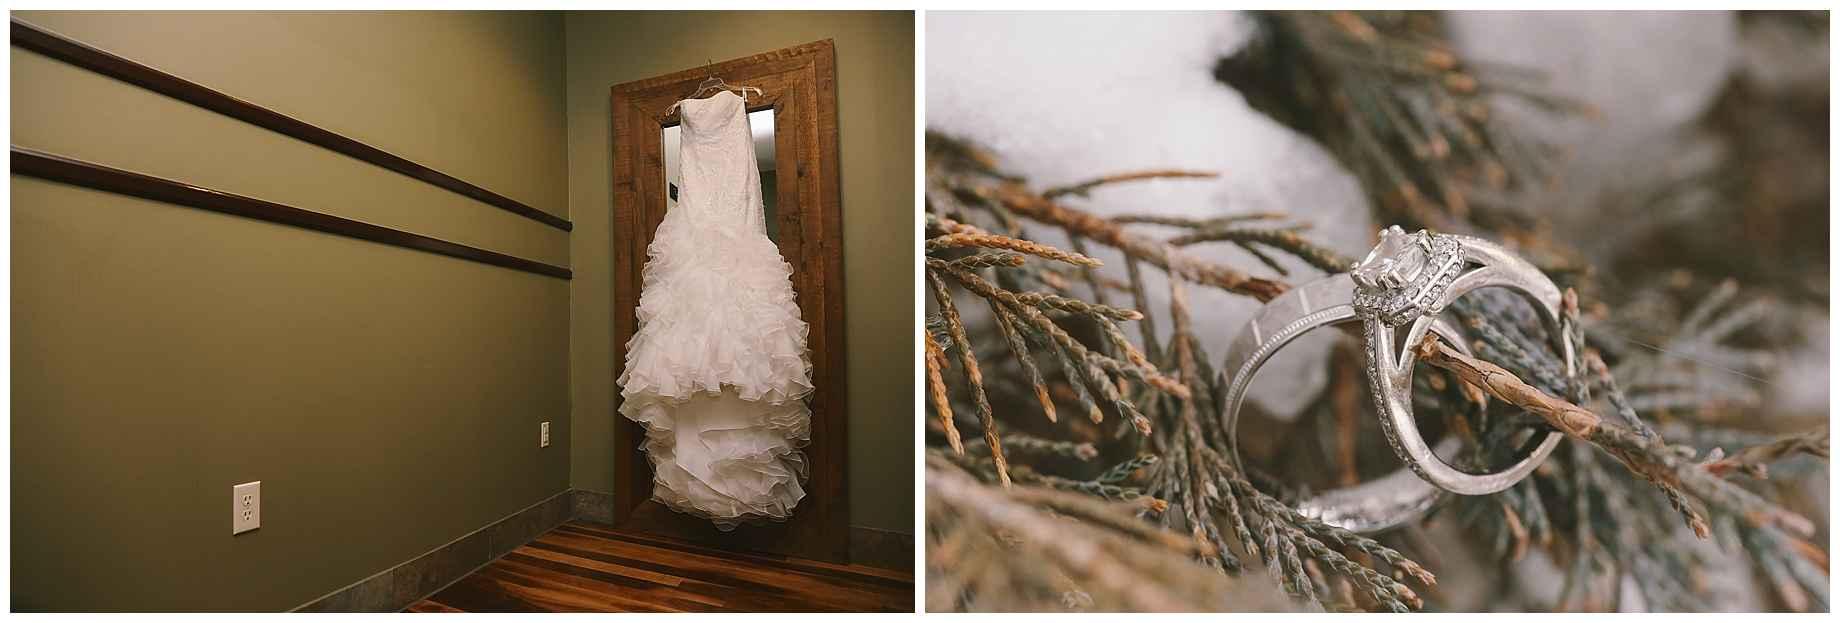 dallas-wedding-photographer-03